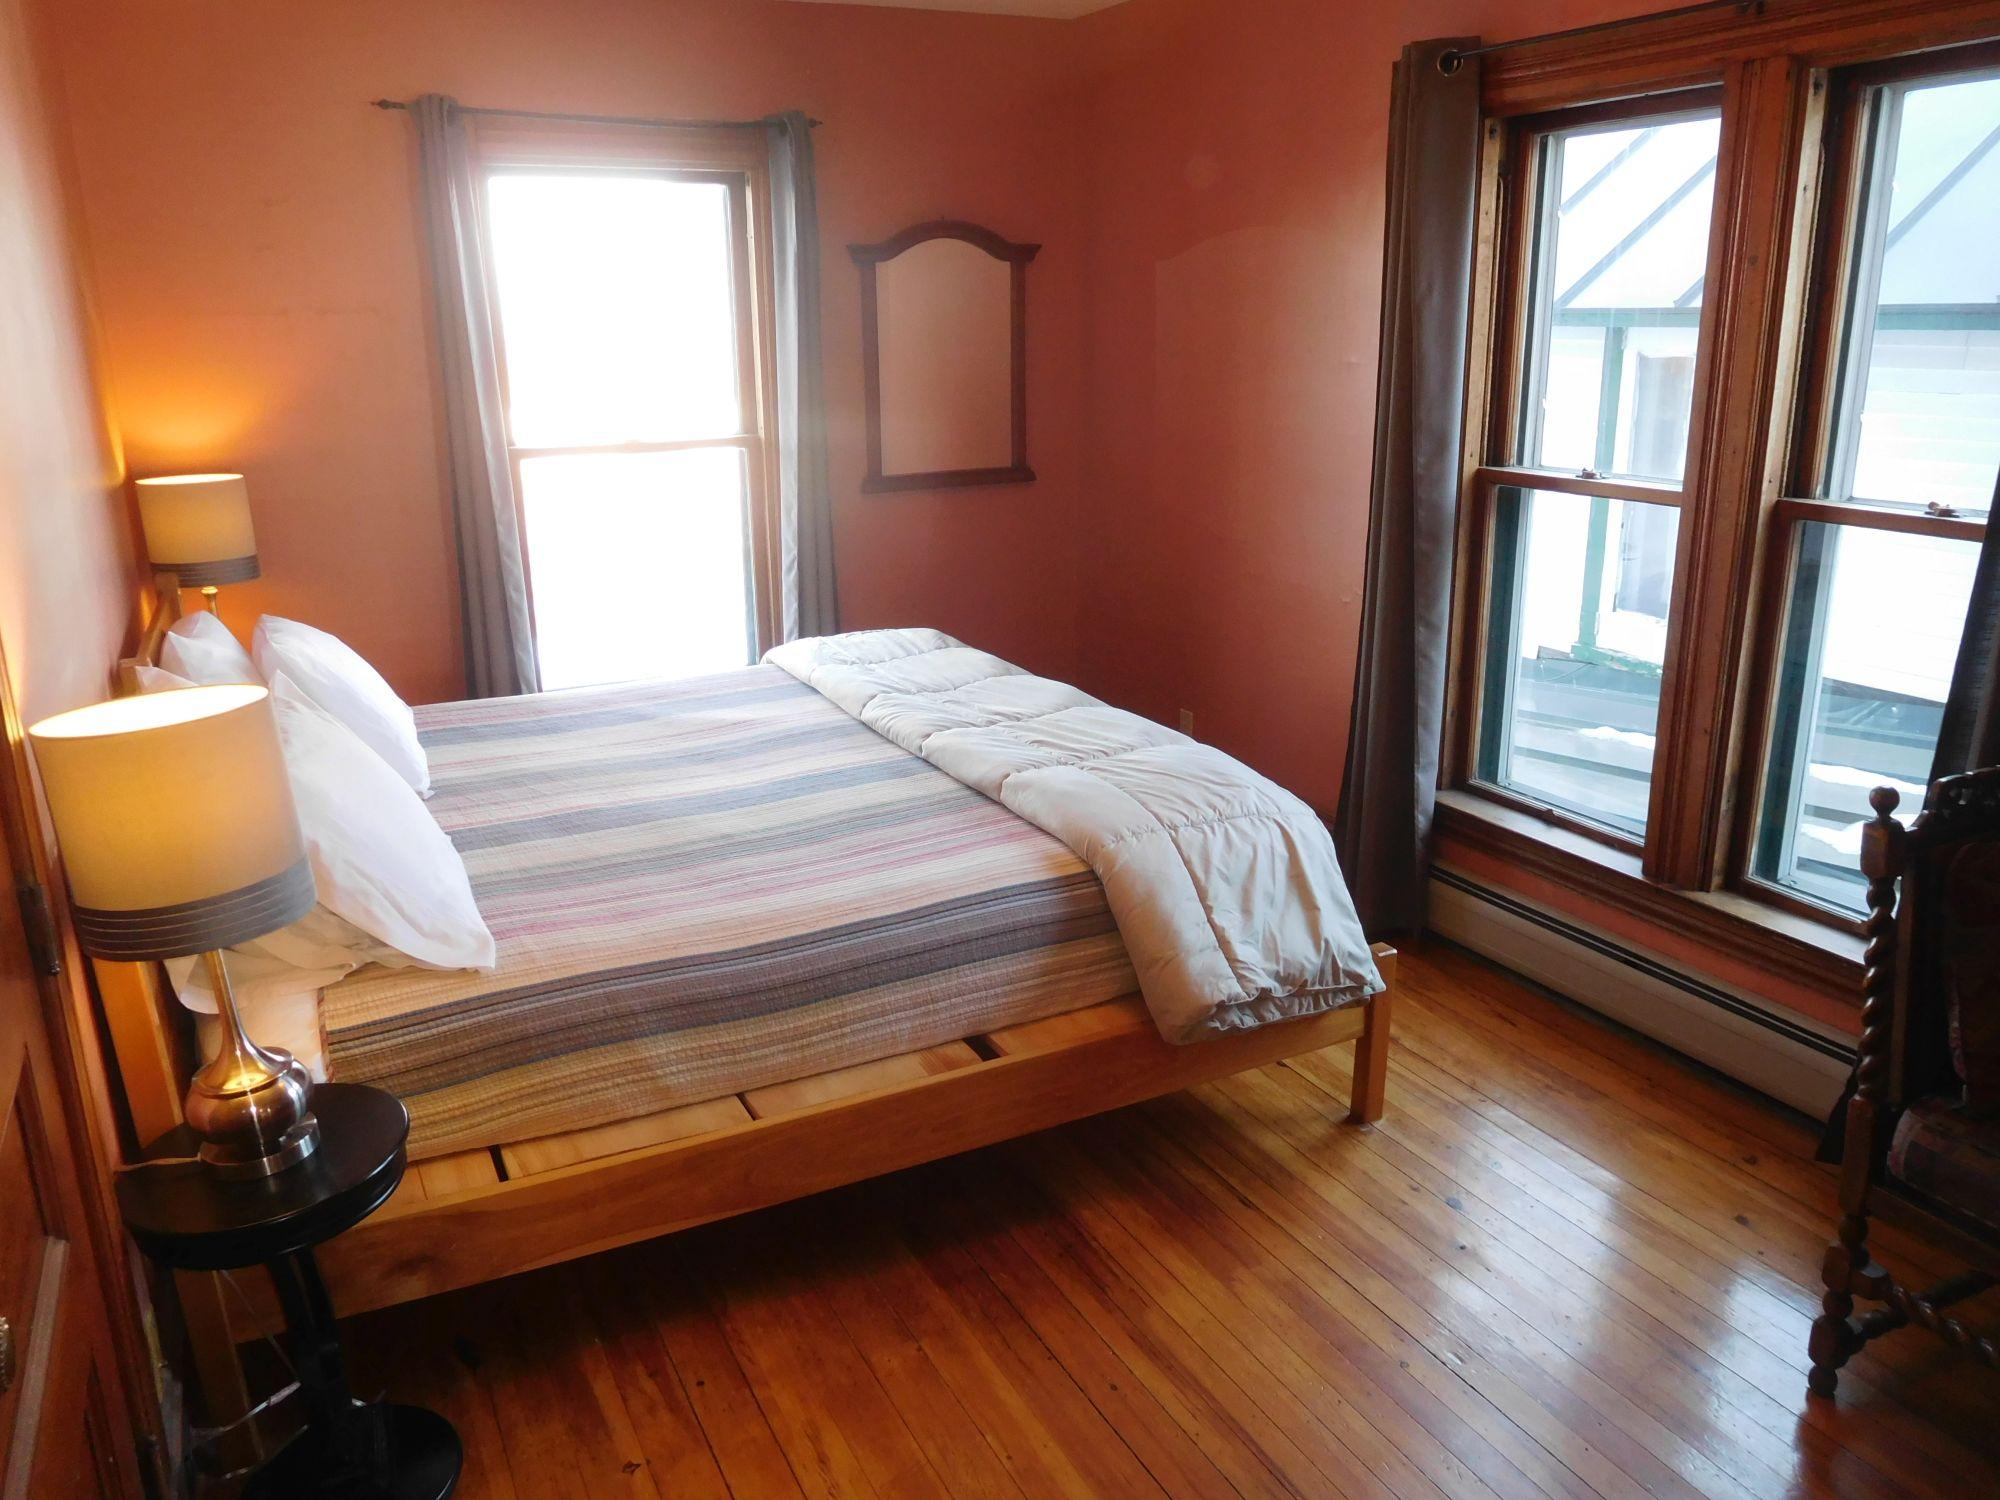 Master bedroom, handmade king bed, west windows facing the lake, sunset.